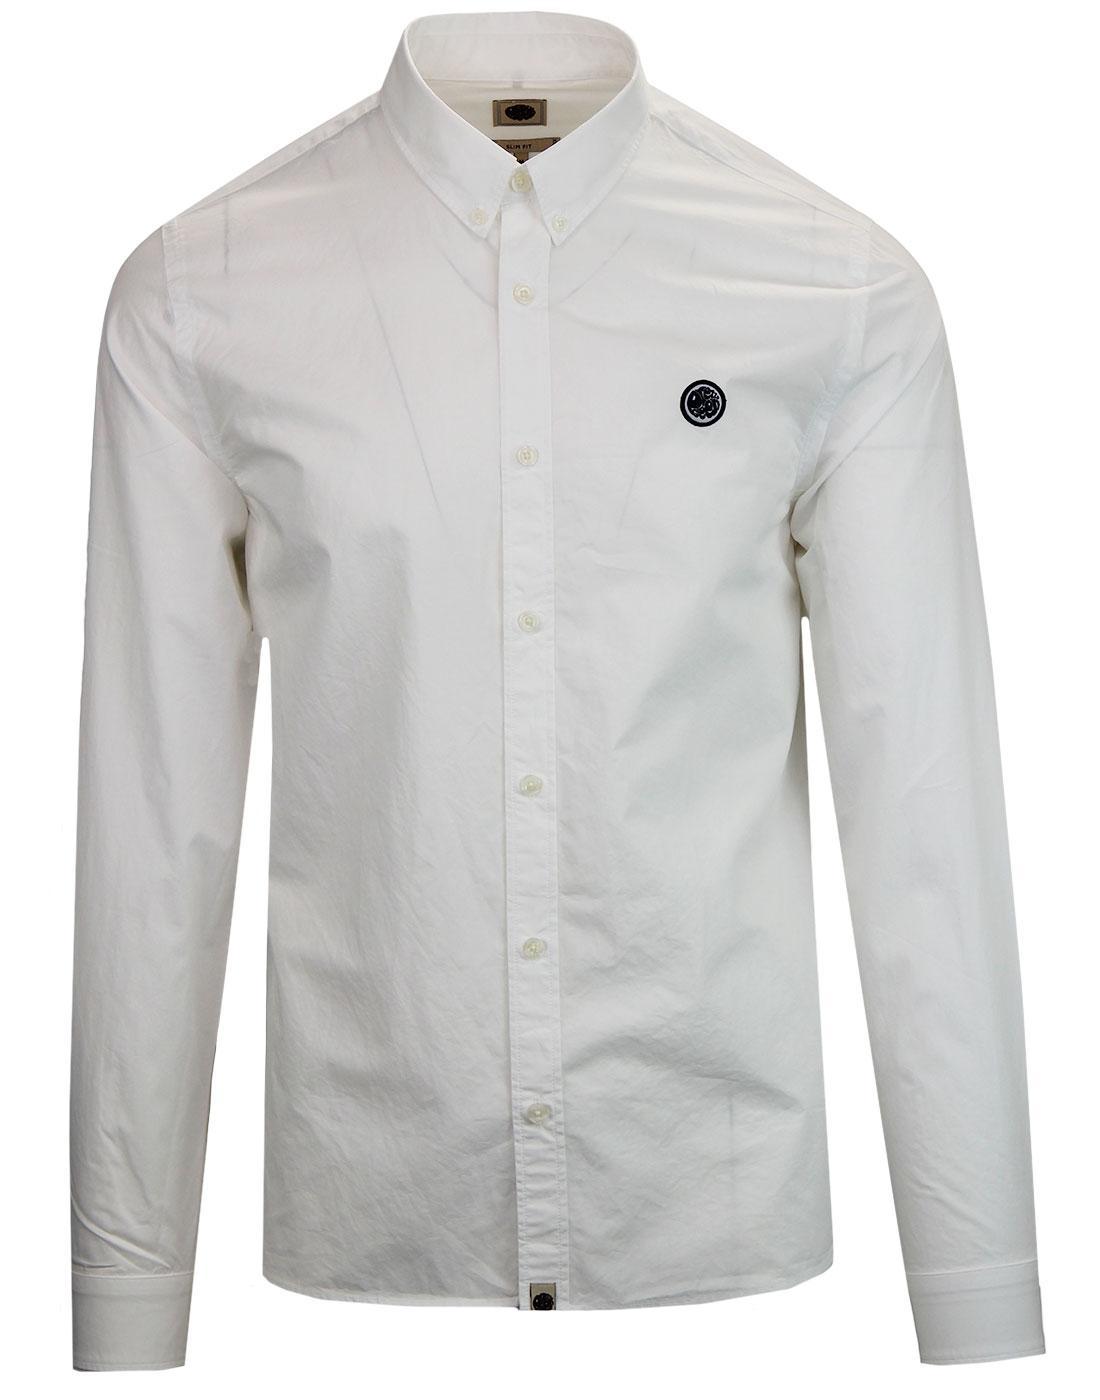 PRETTY GREEN Retro Mod Badge Button Down Shirt (W)